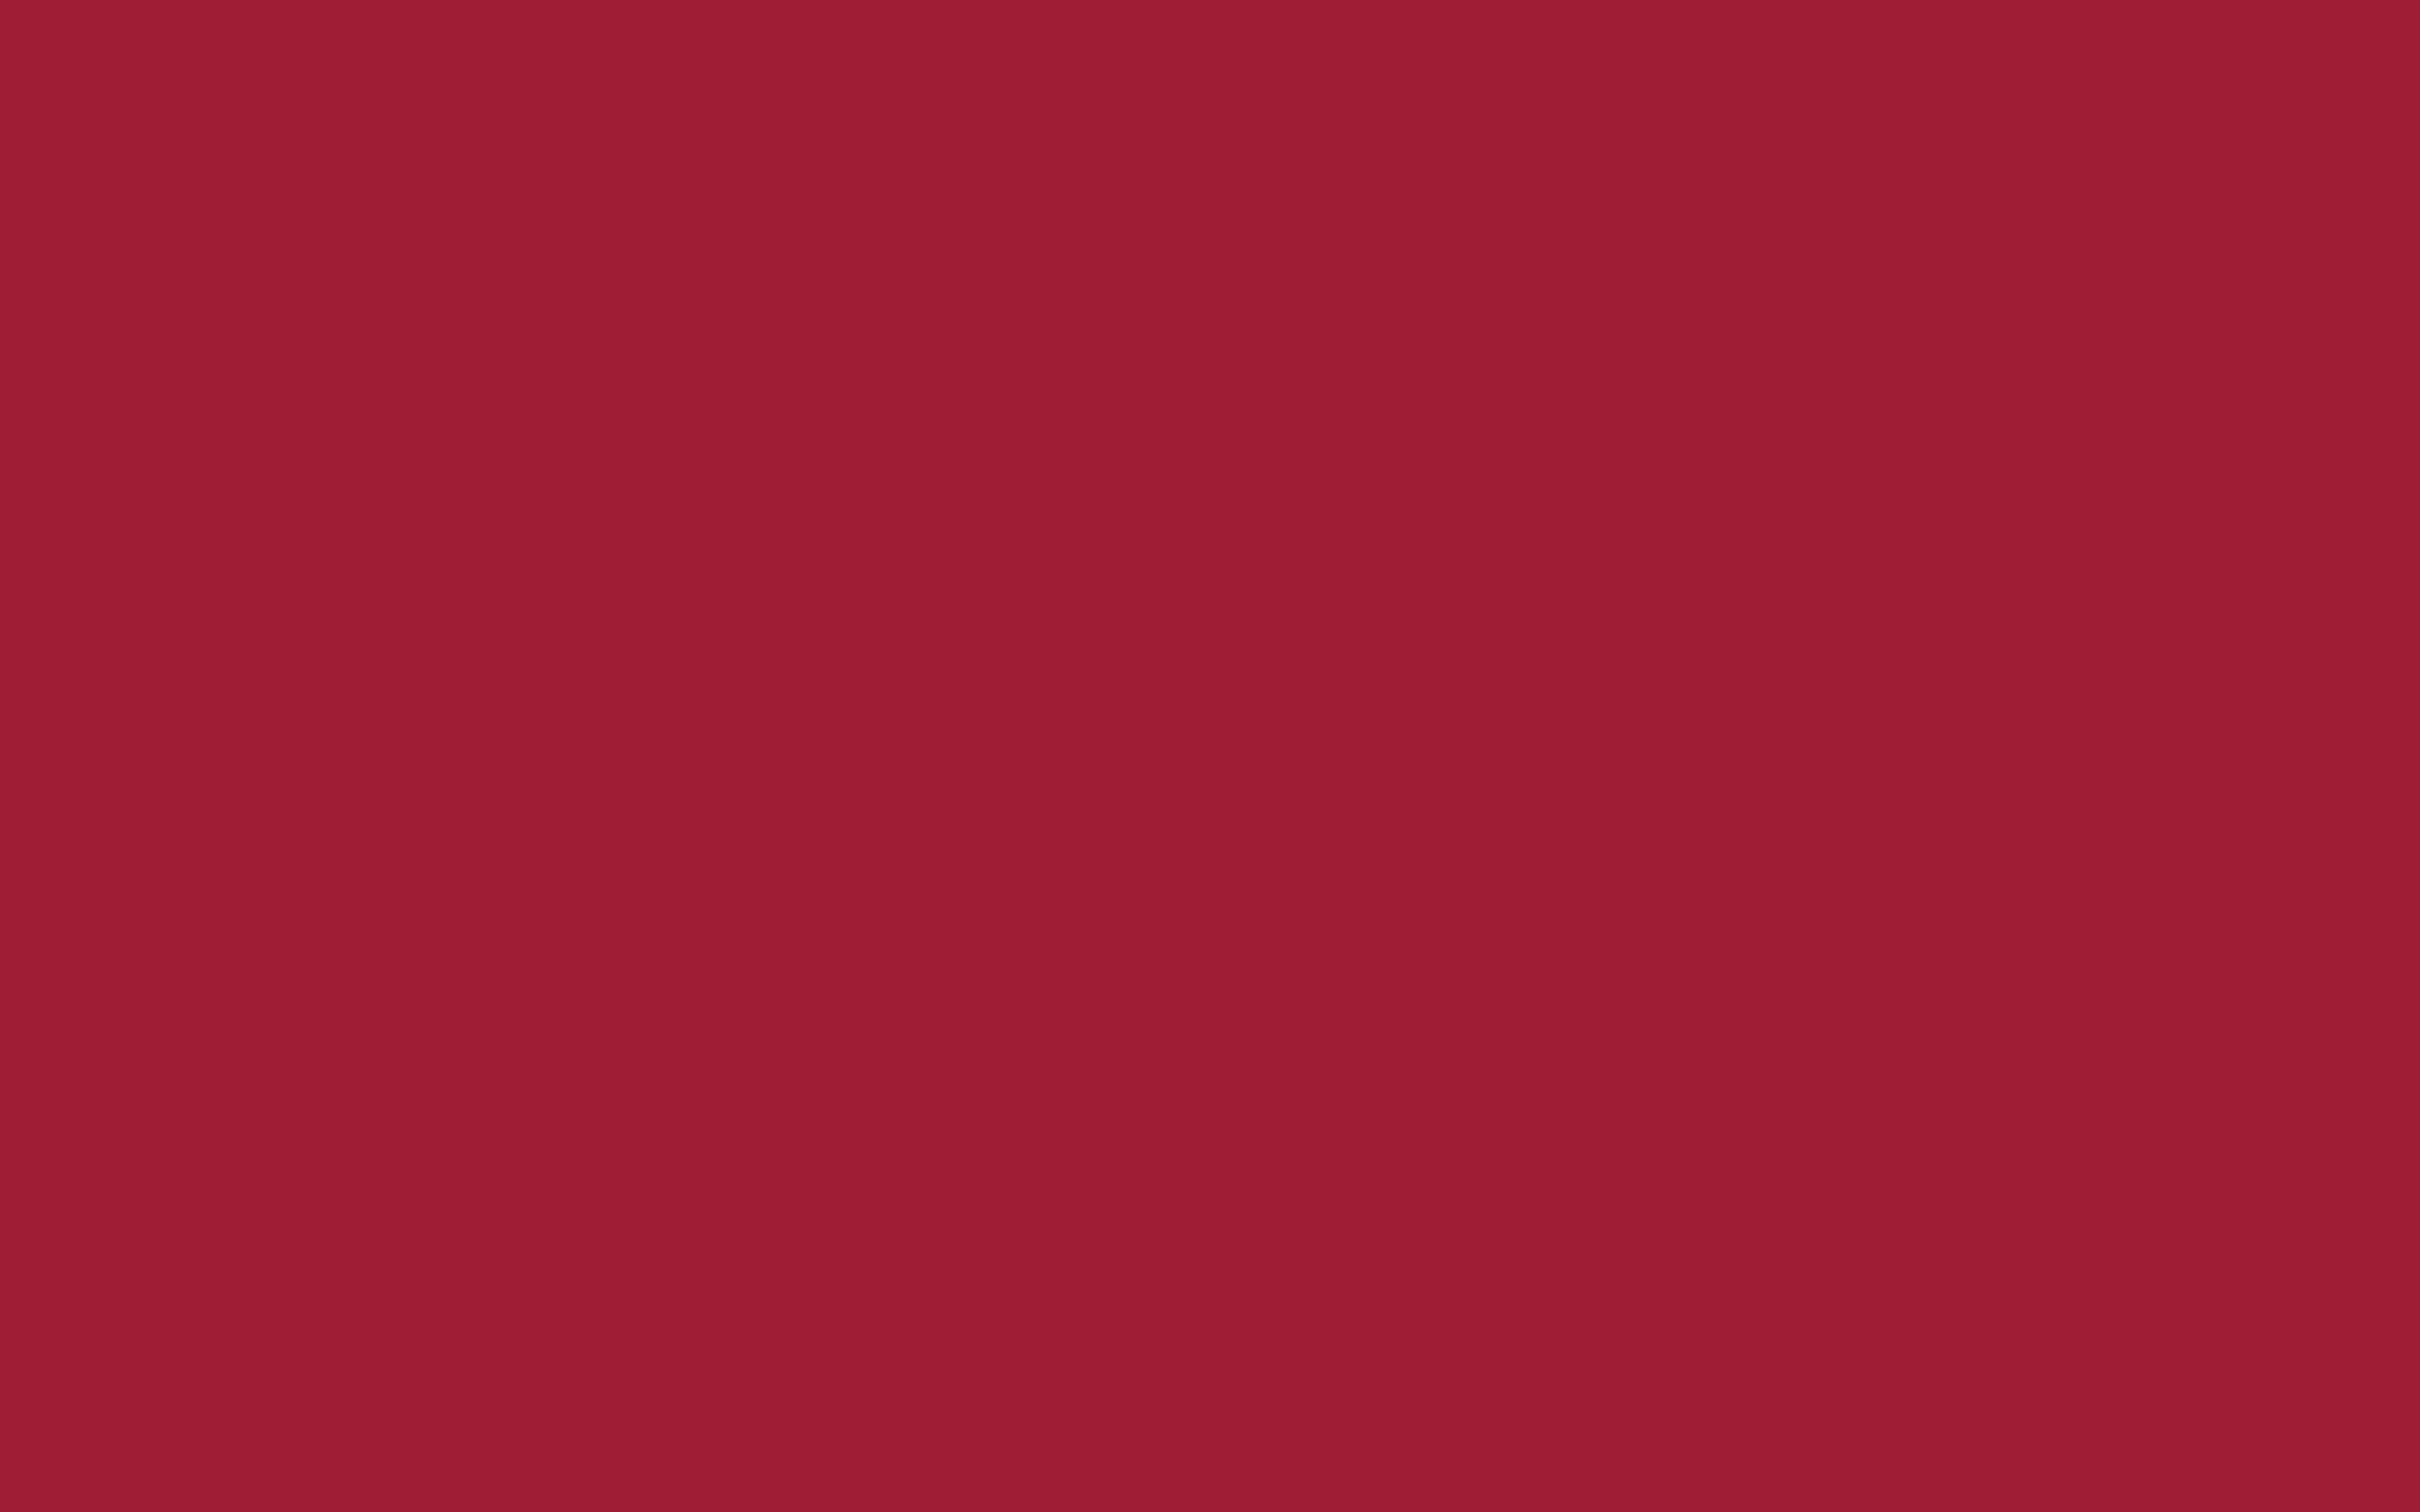 2560x1600 Vivid Burgundy Solid Color Background